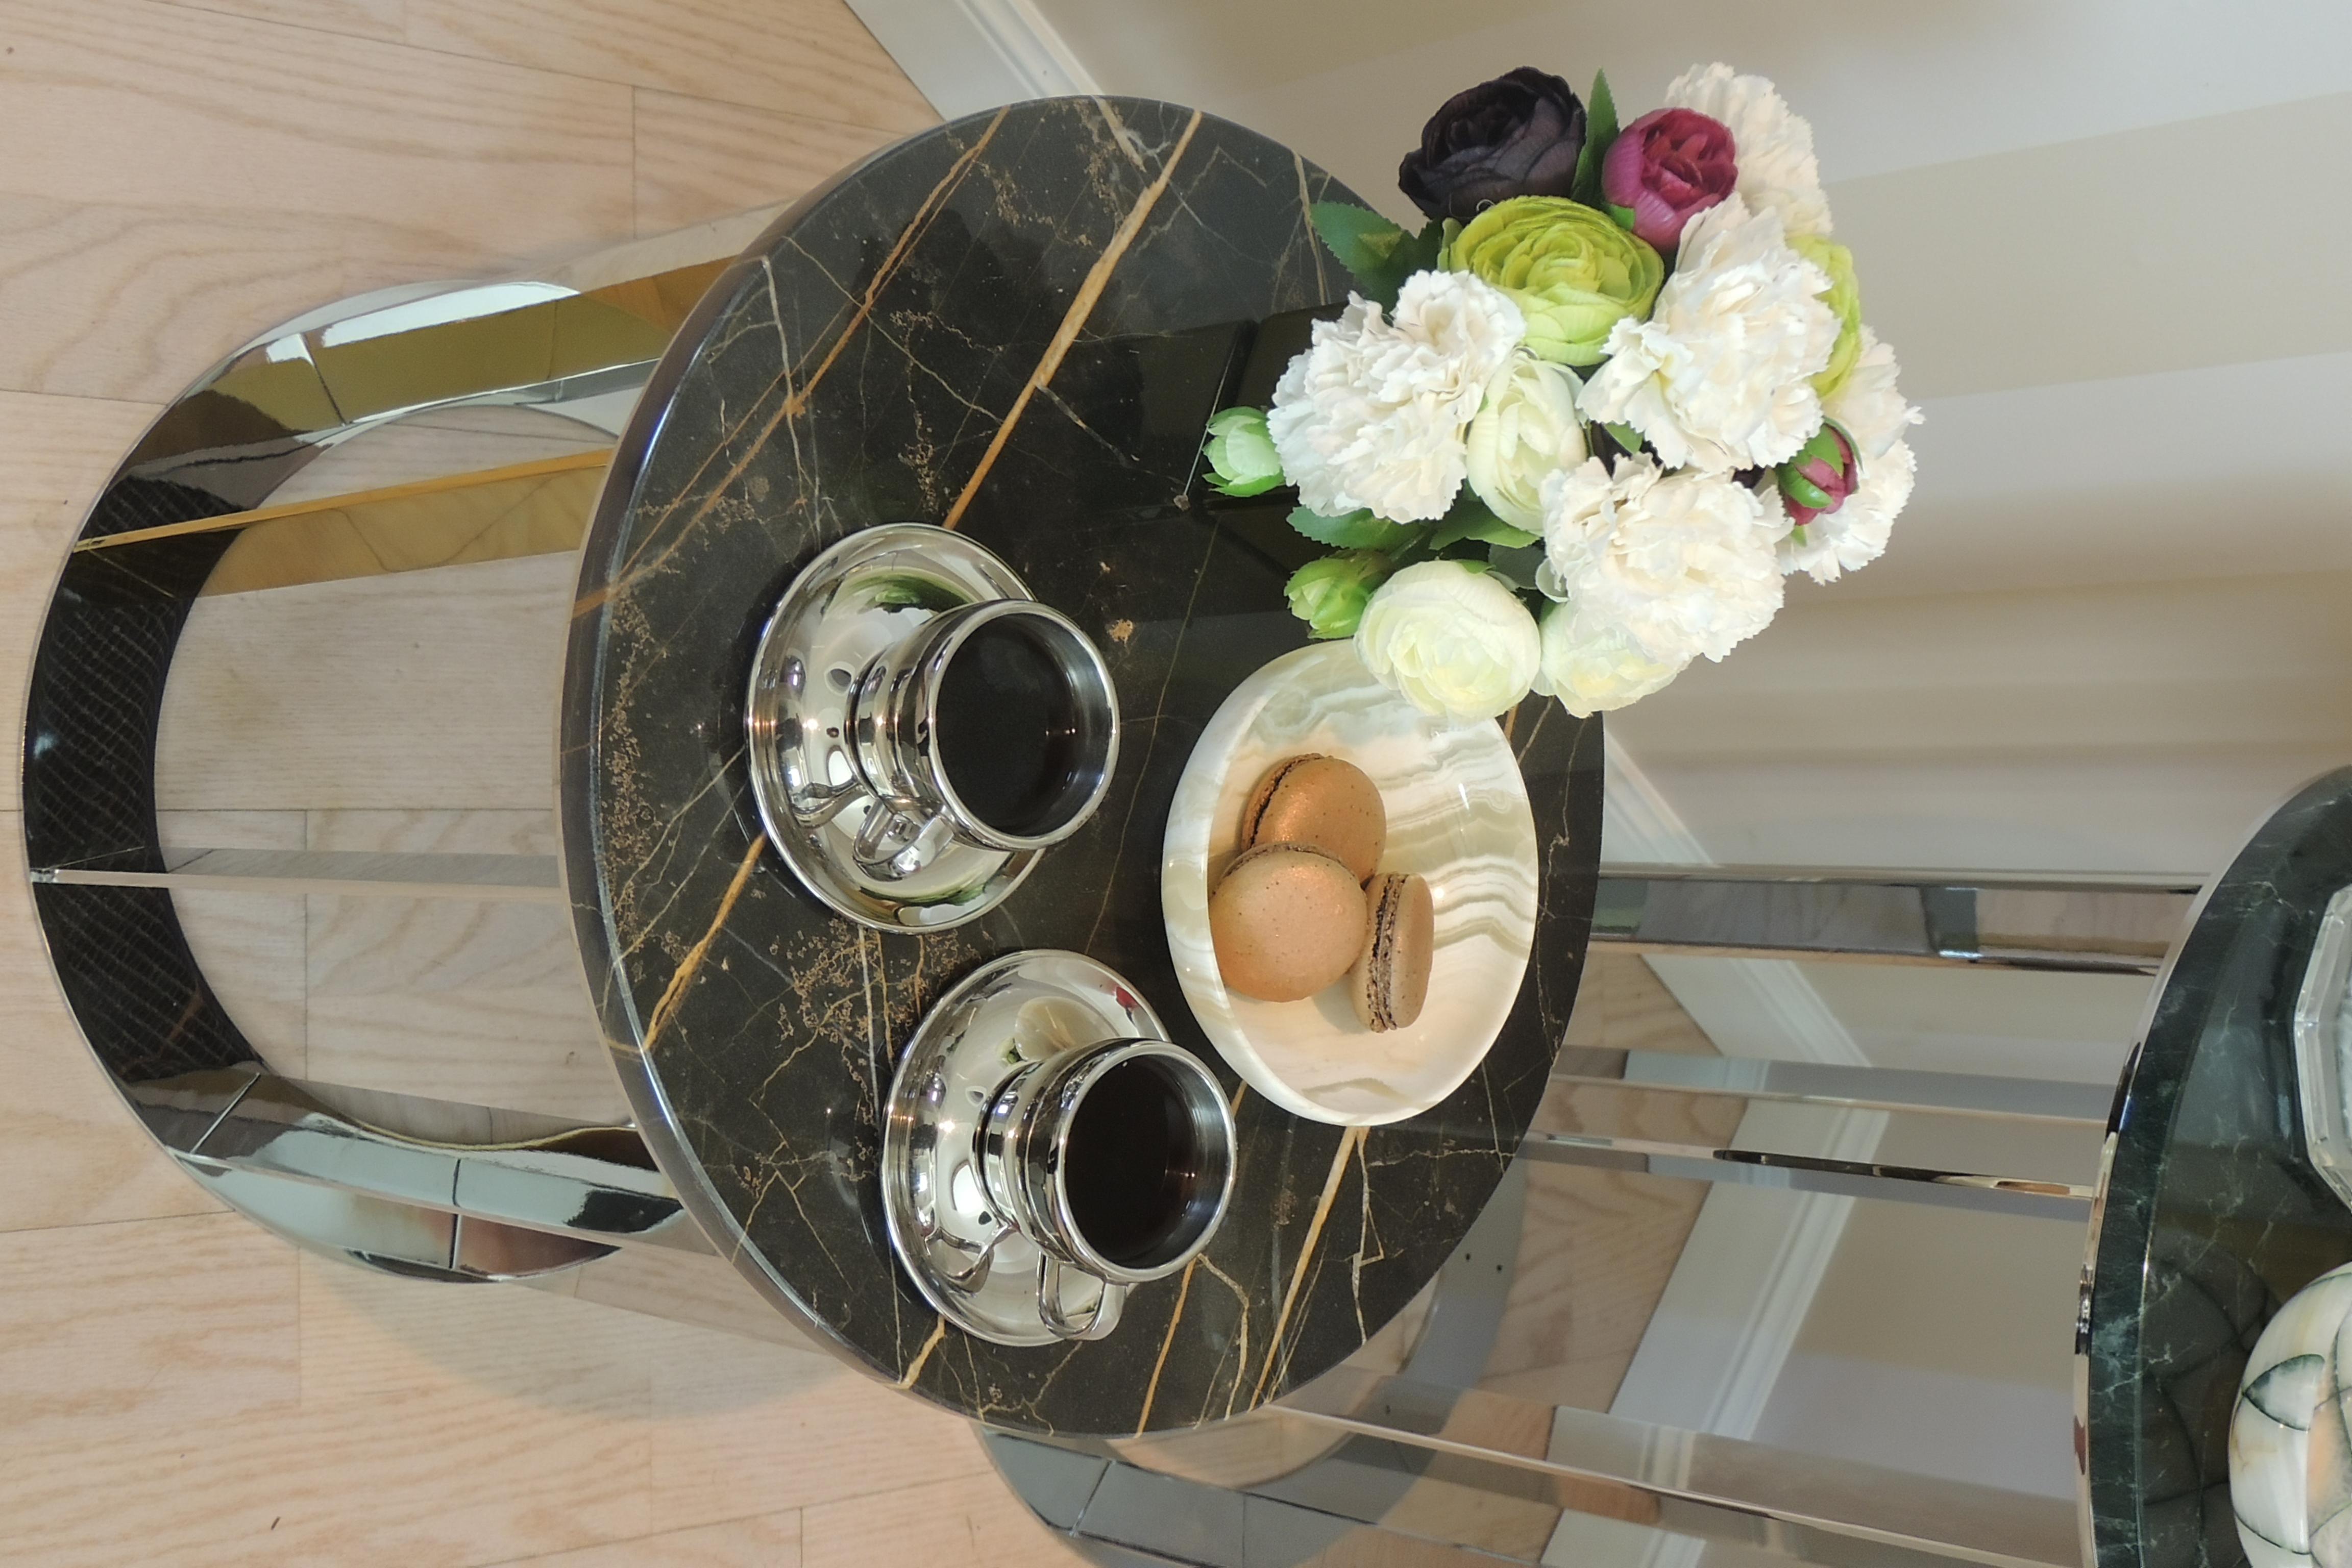 Scotty stolik kawowy